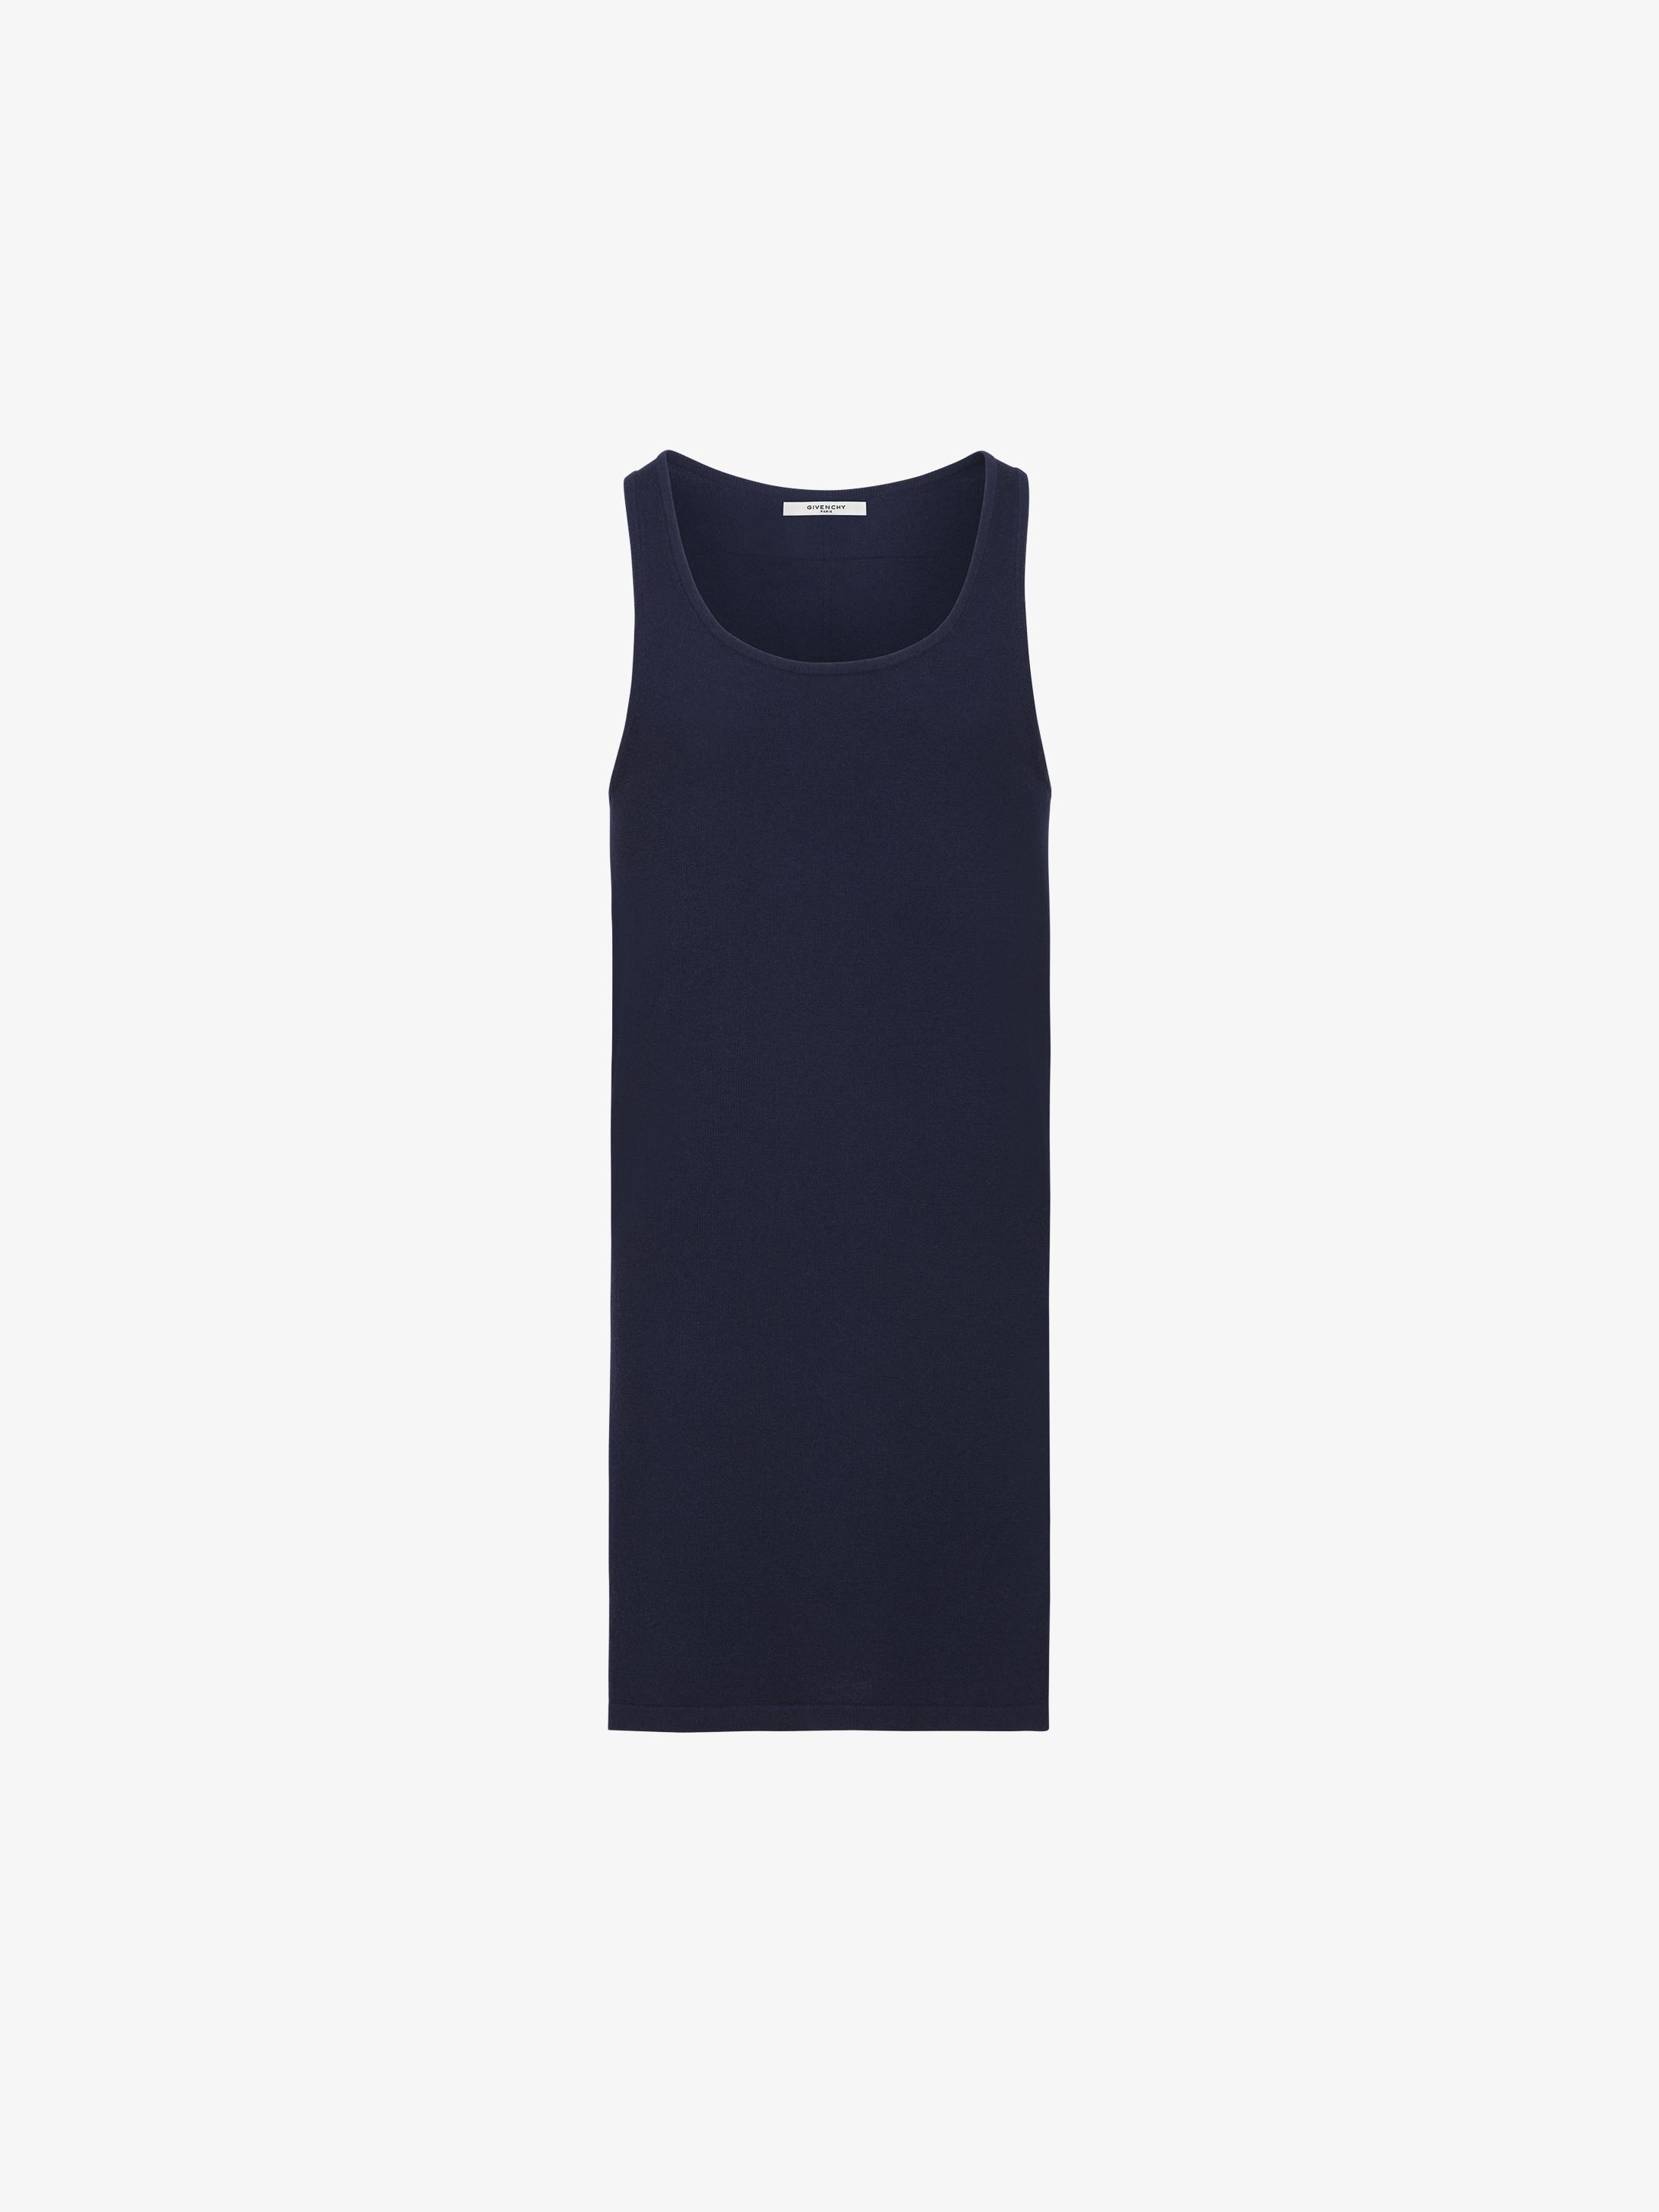 b61d64e8e0396 Givenchy Long tank top in wool